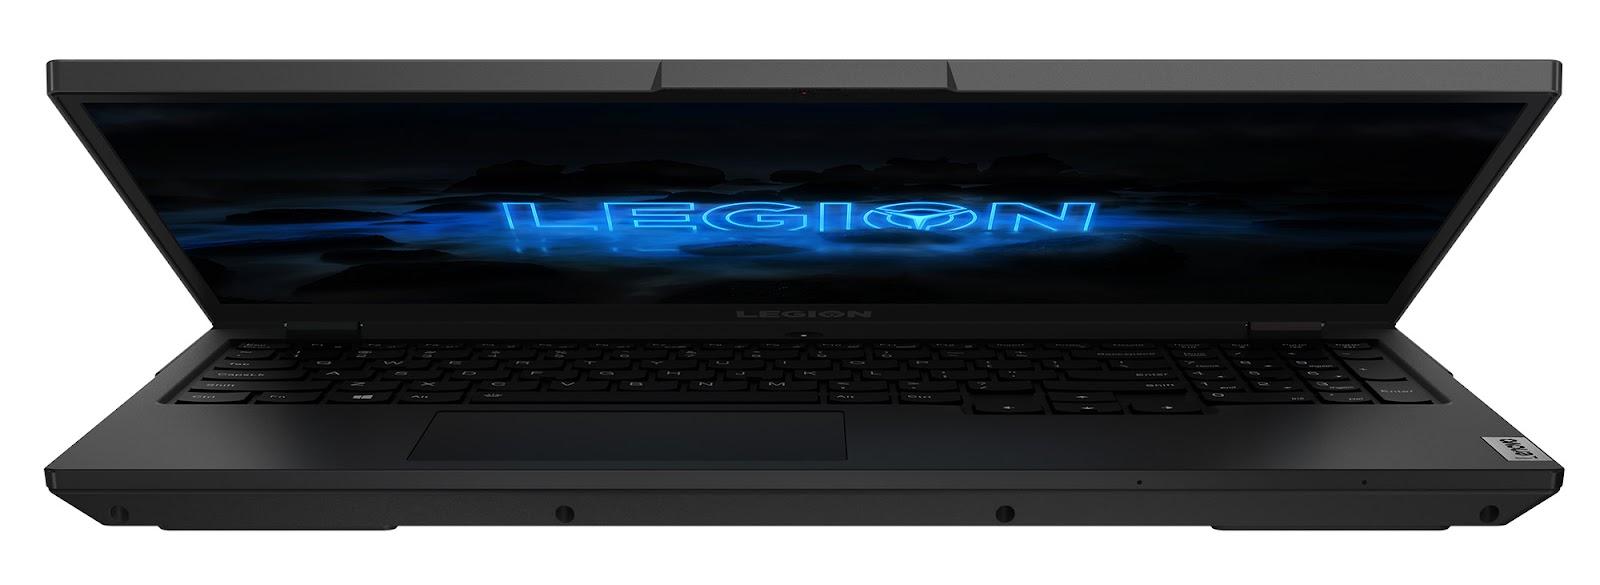 Фото 1. Ноутбук Lenovo Legion 5 15IMH05 Phantom Black (82AU00BDRE)